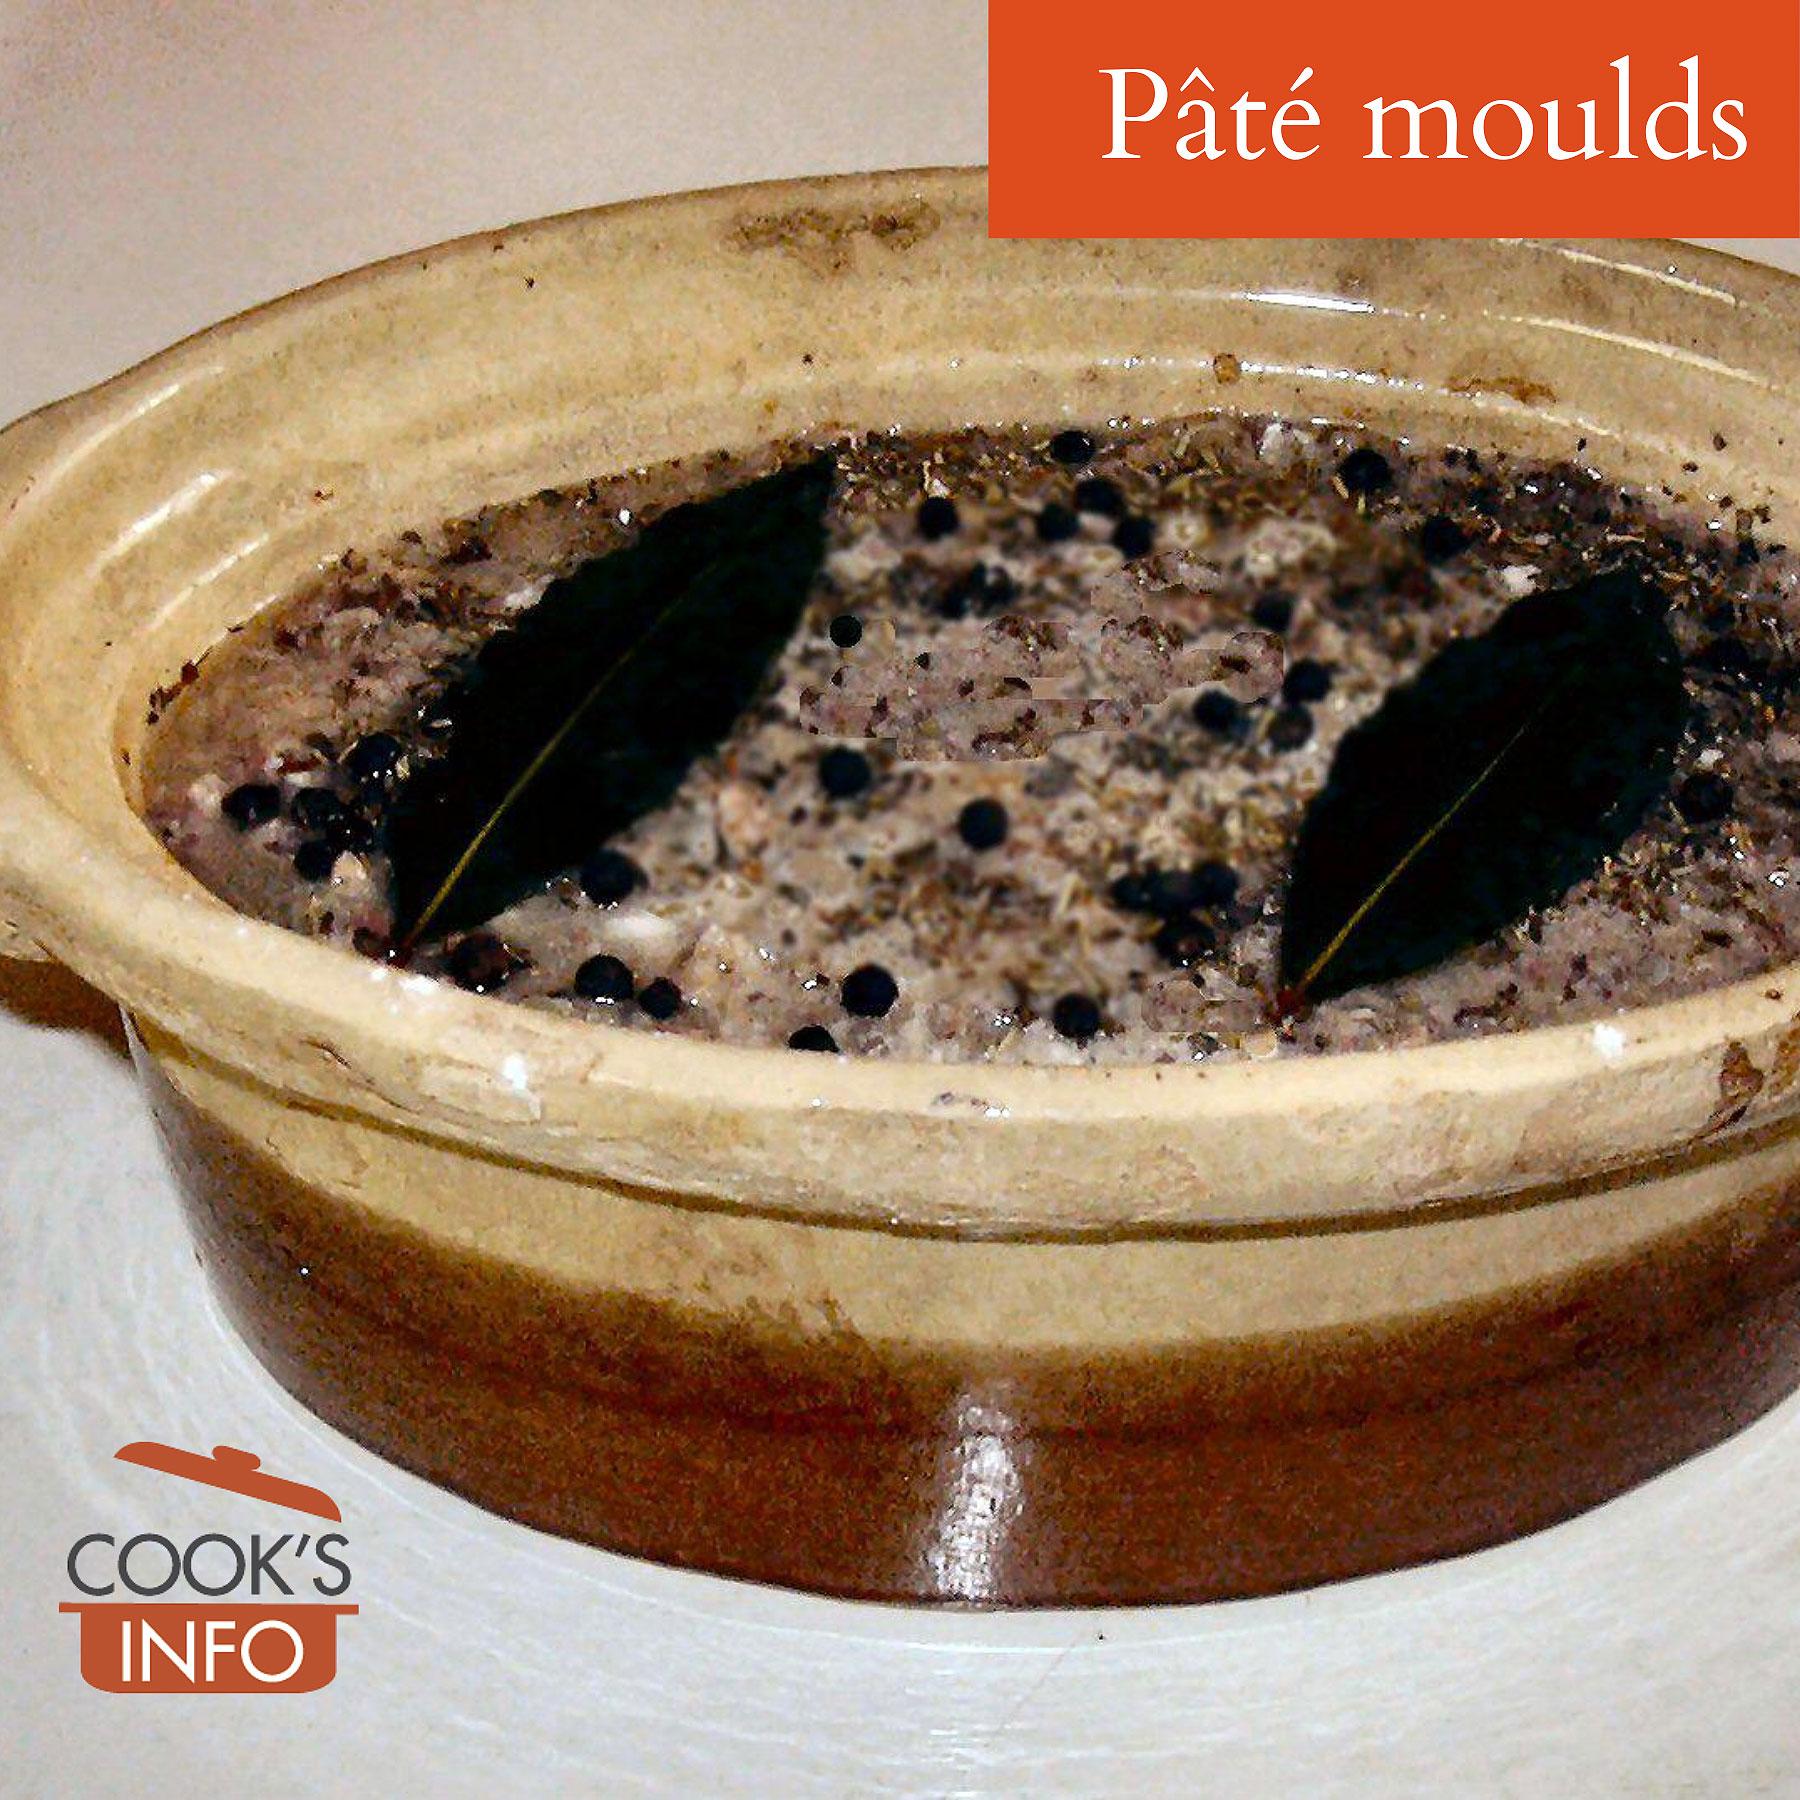 Pâté in an earthenware mould